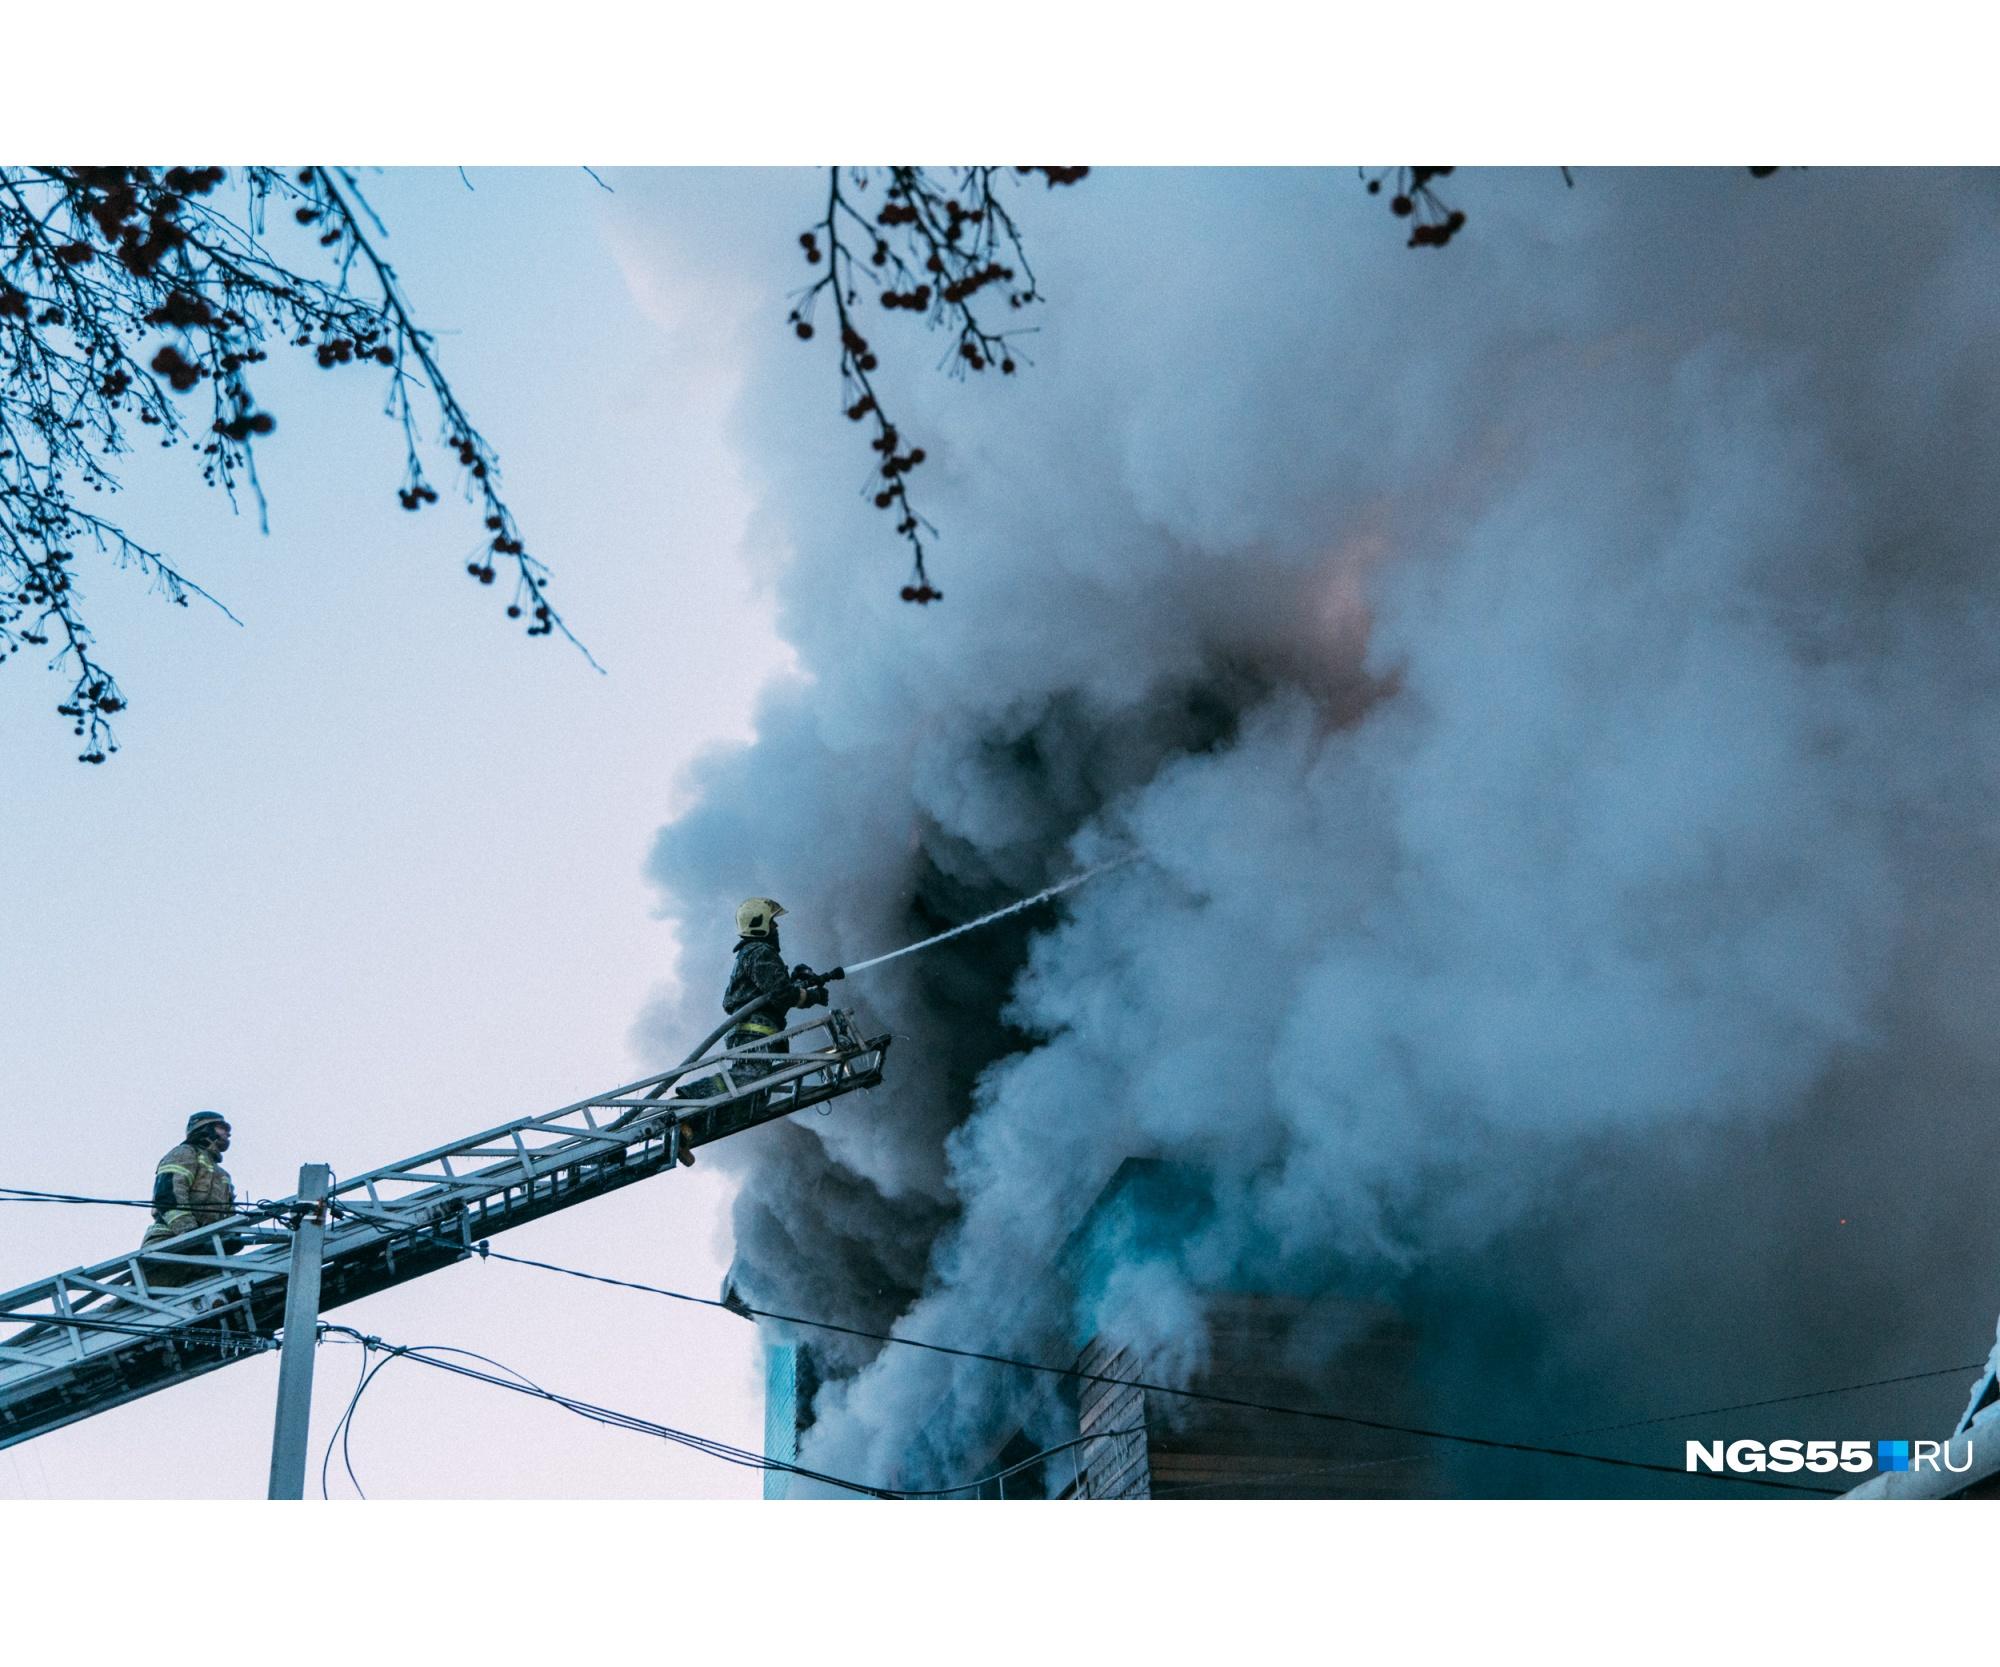 Фигуры пожарных были едва заметны на фоне огромных клубов дыма